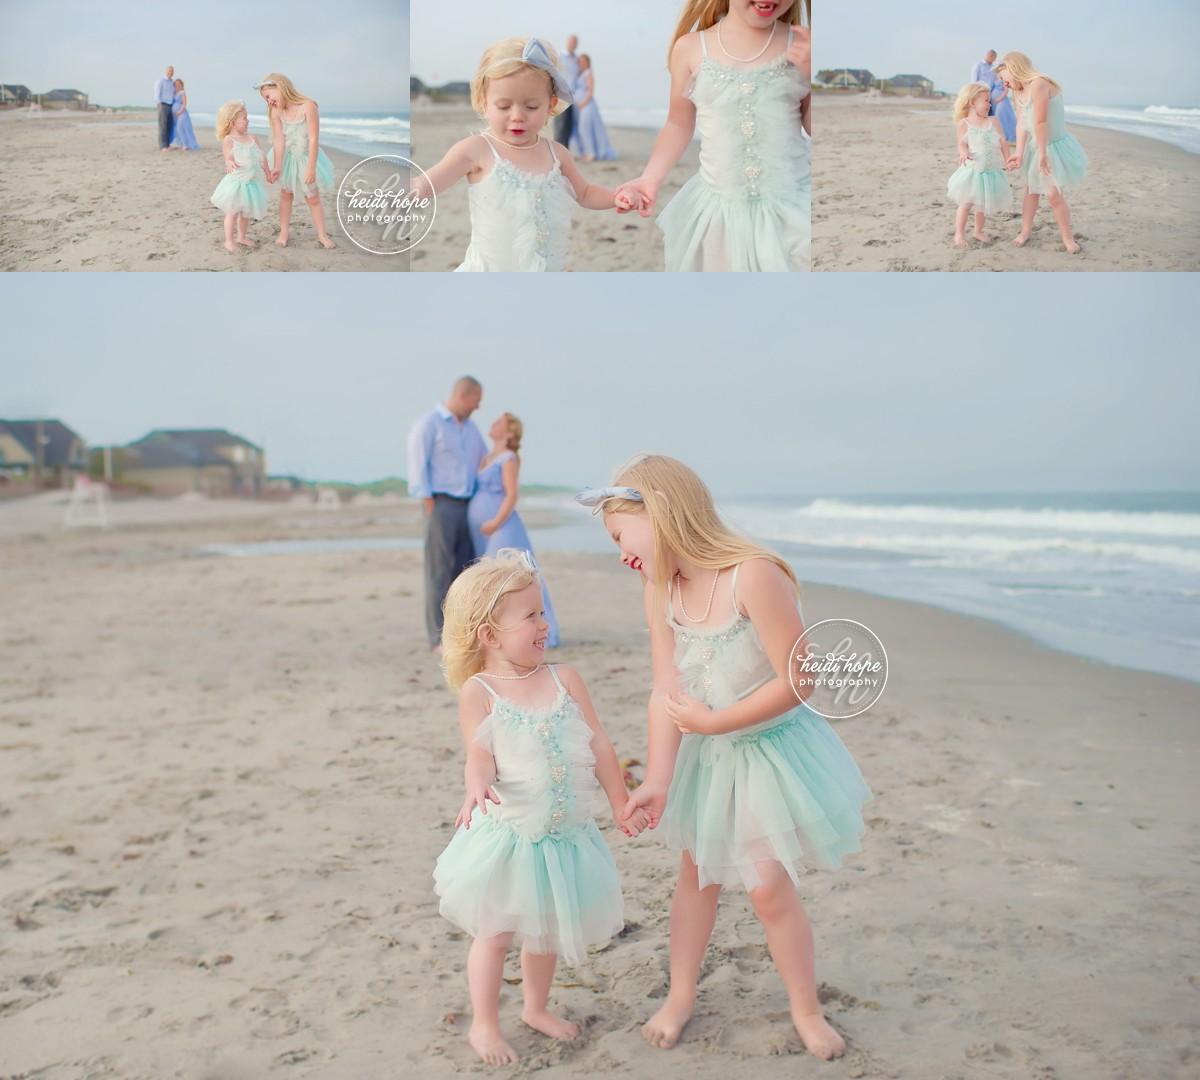 boston_massachusetts_maternity_photographer_portraits_on_the_beach_005